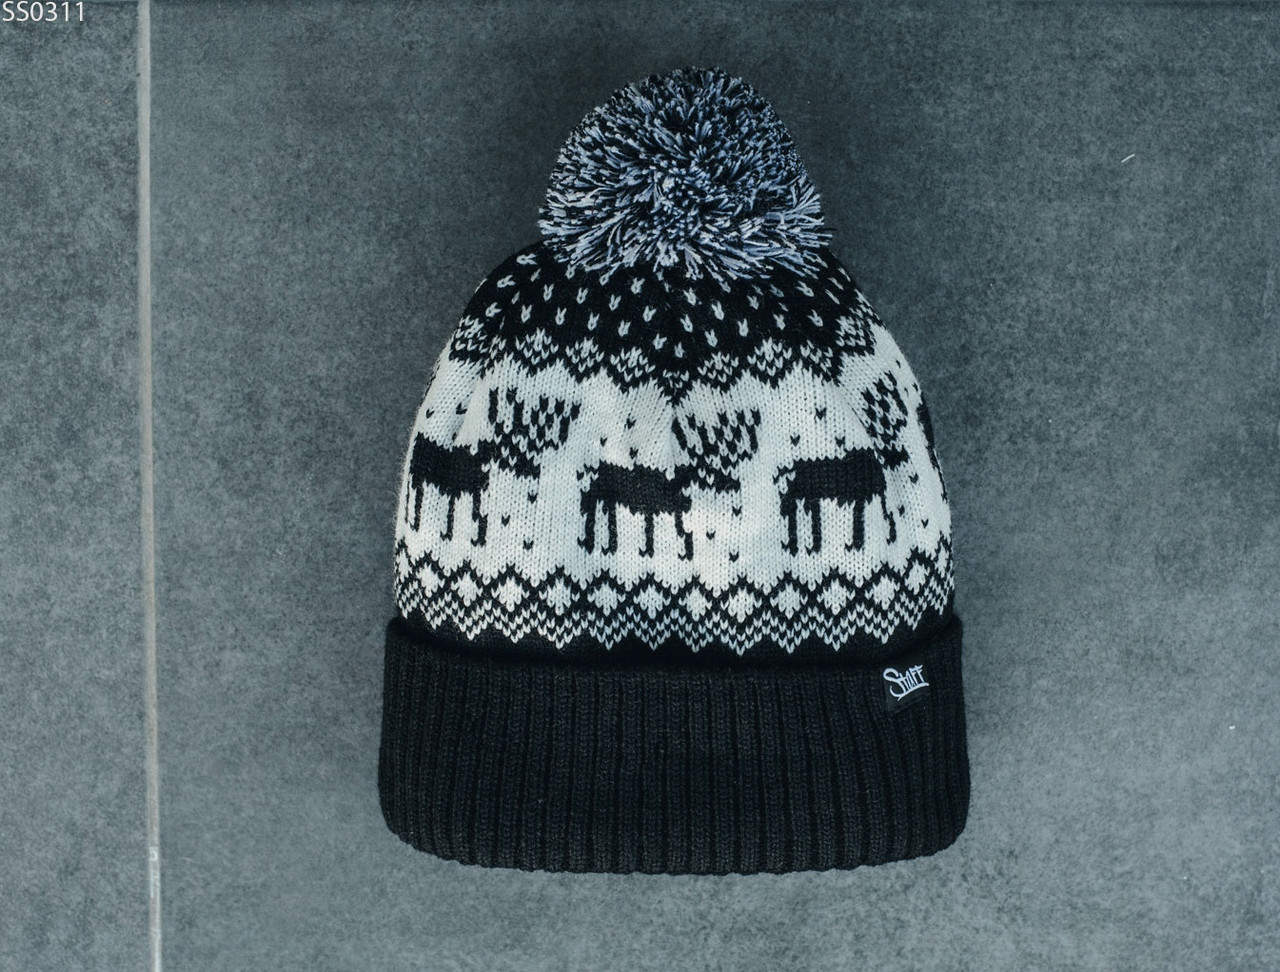 Шапка Staff black & white pattern